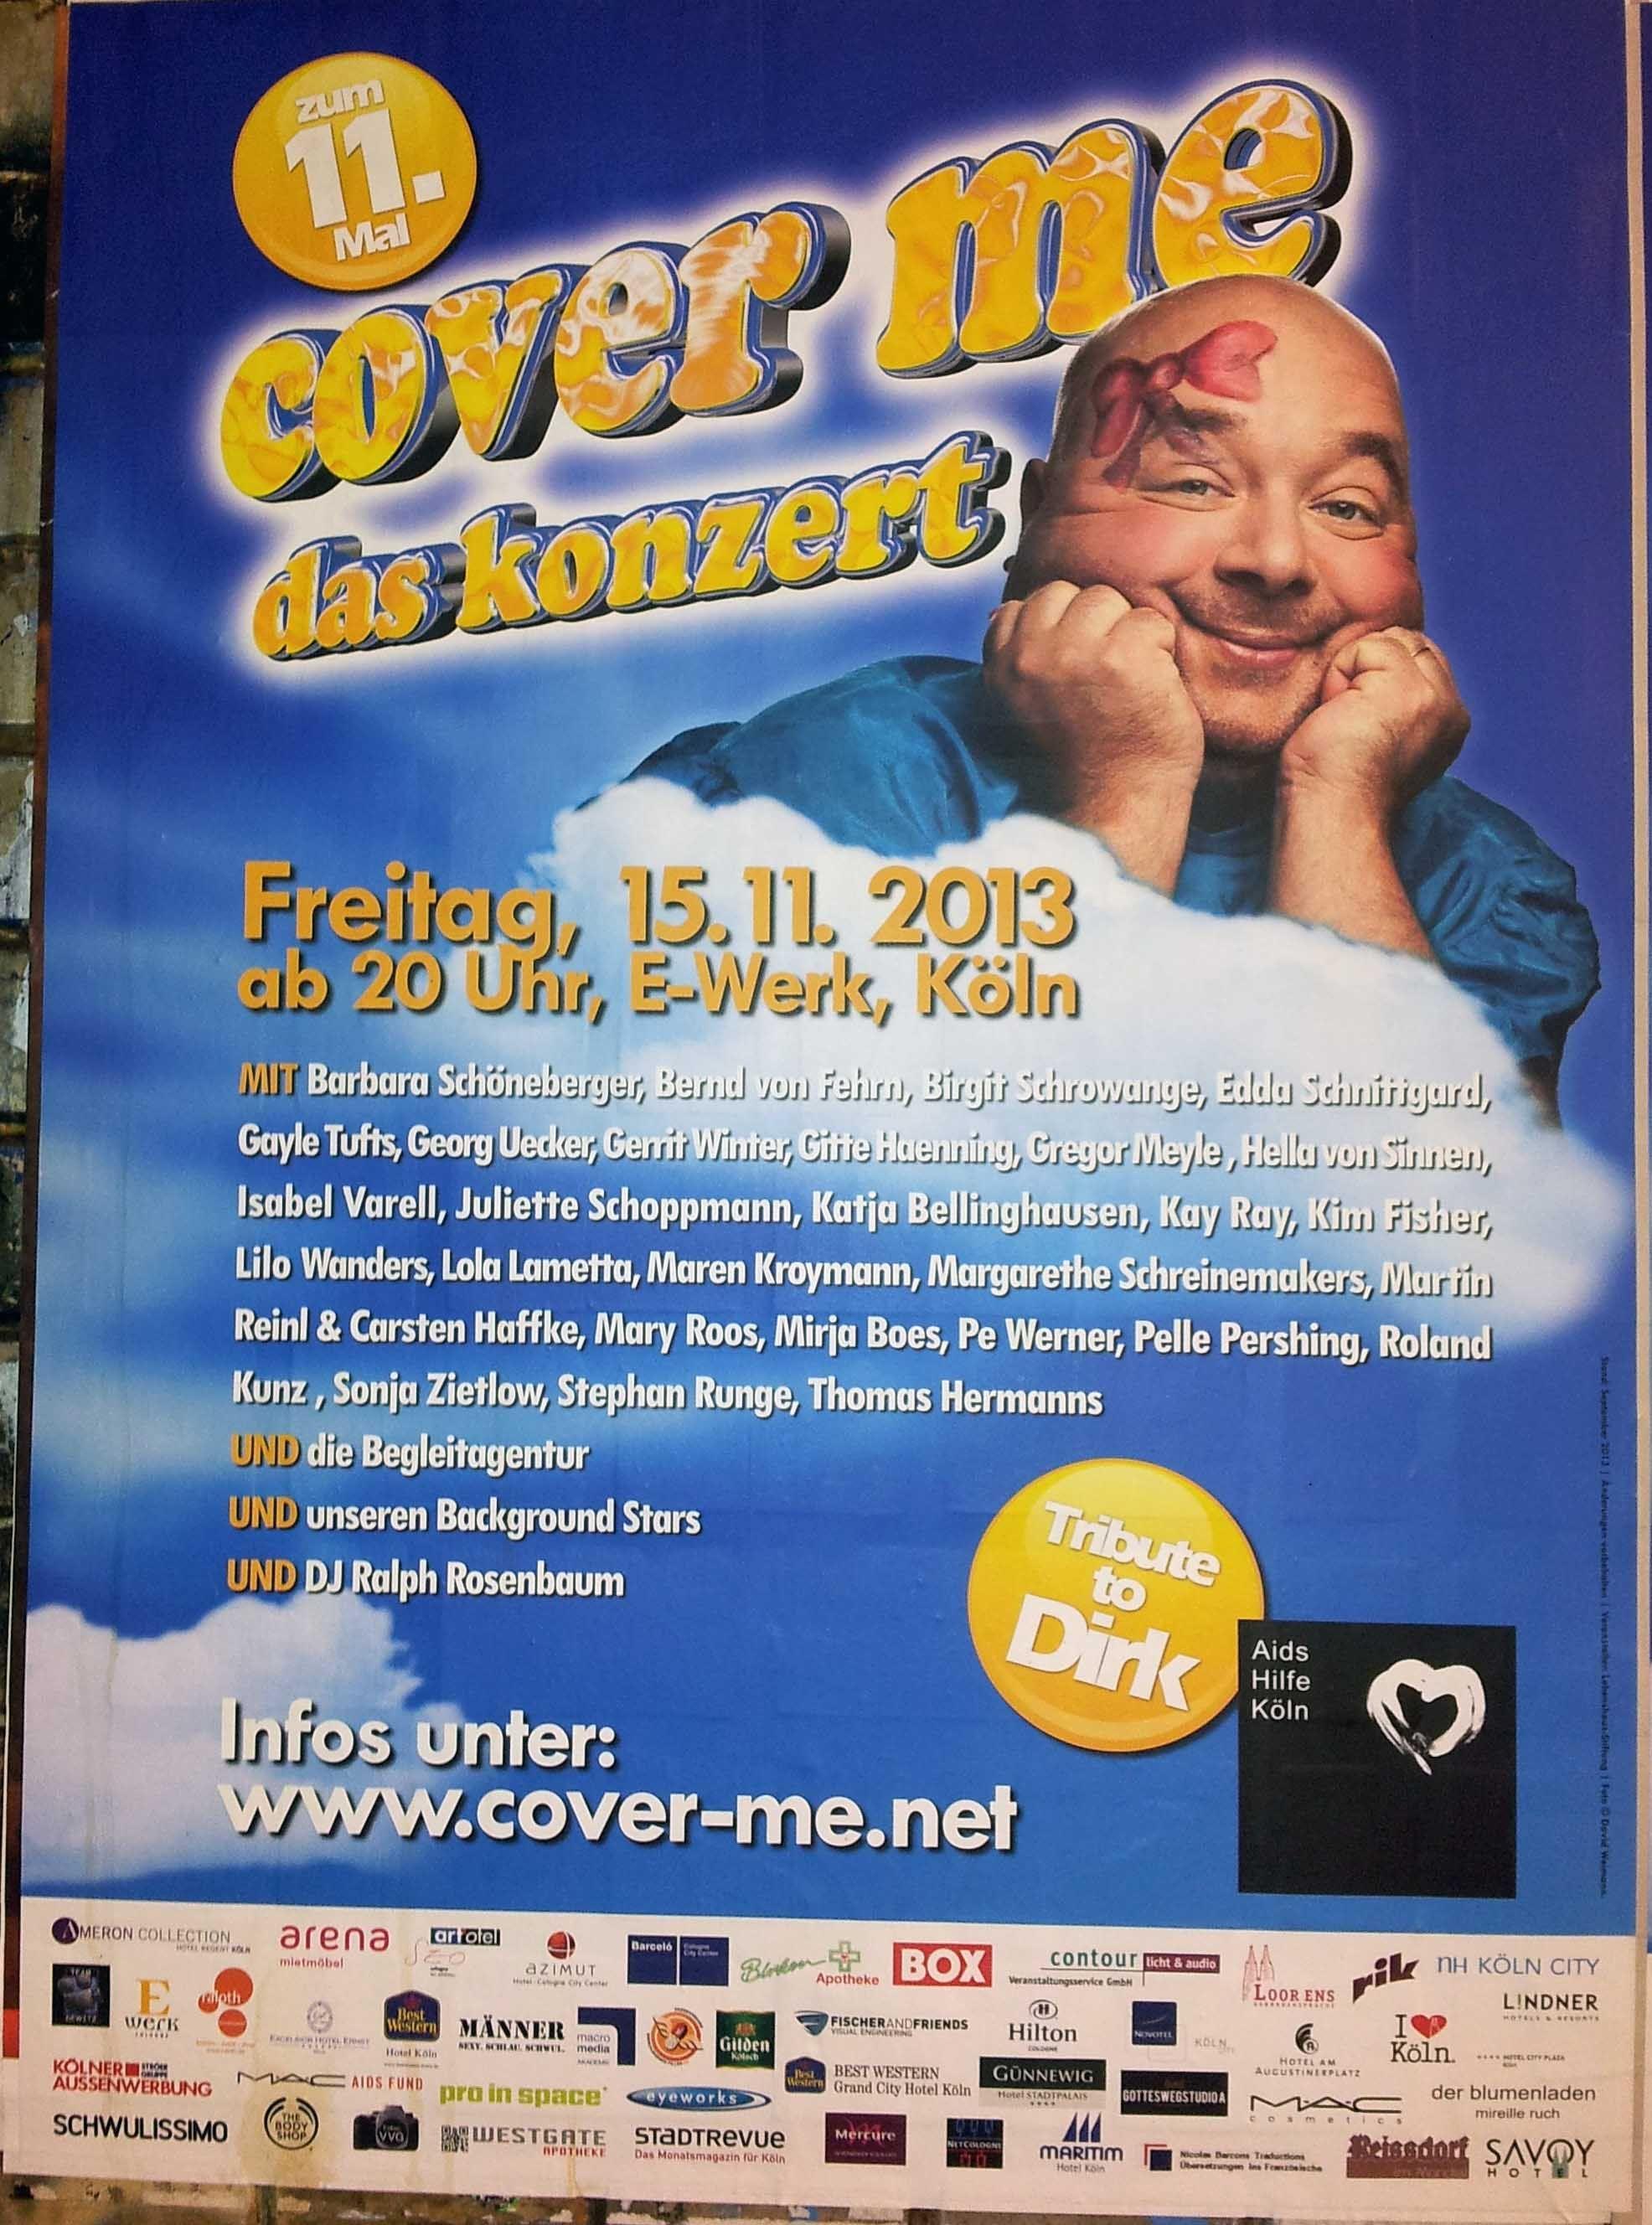 Flachenplakatierung Poster Plakat Tribute To Dirk Bach Plakat Schoppen Leben